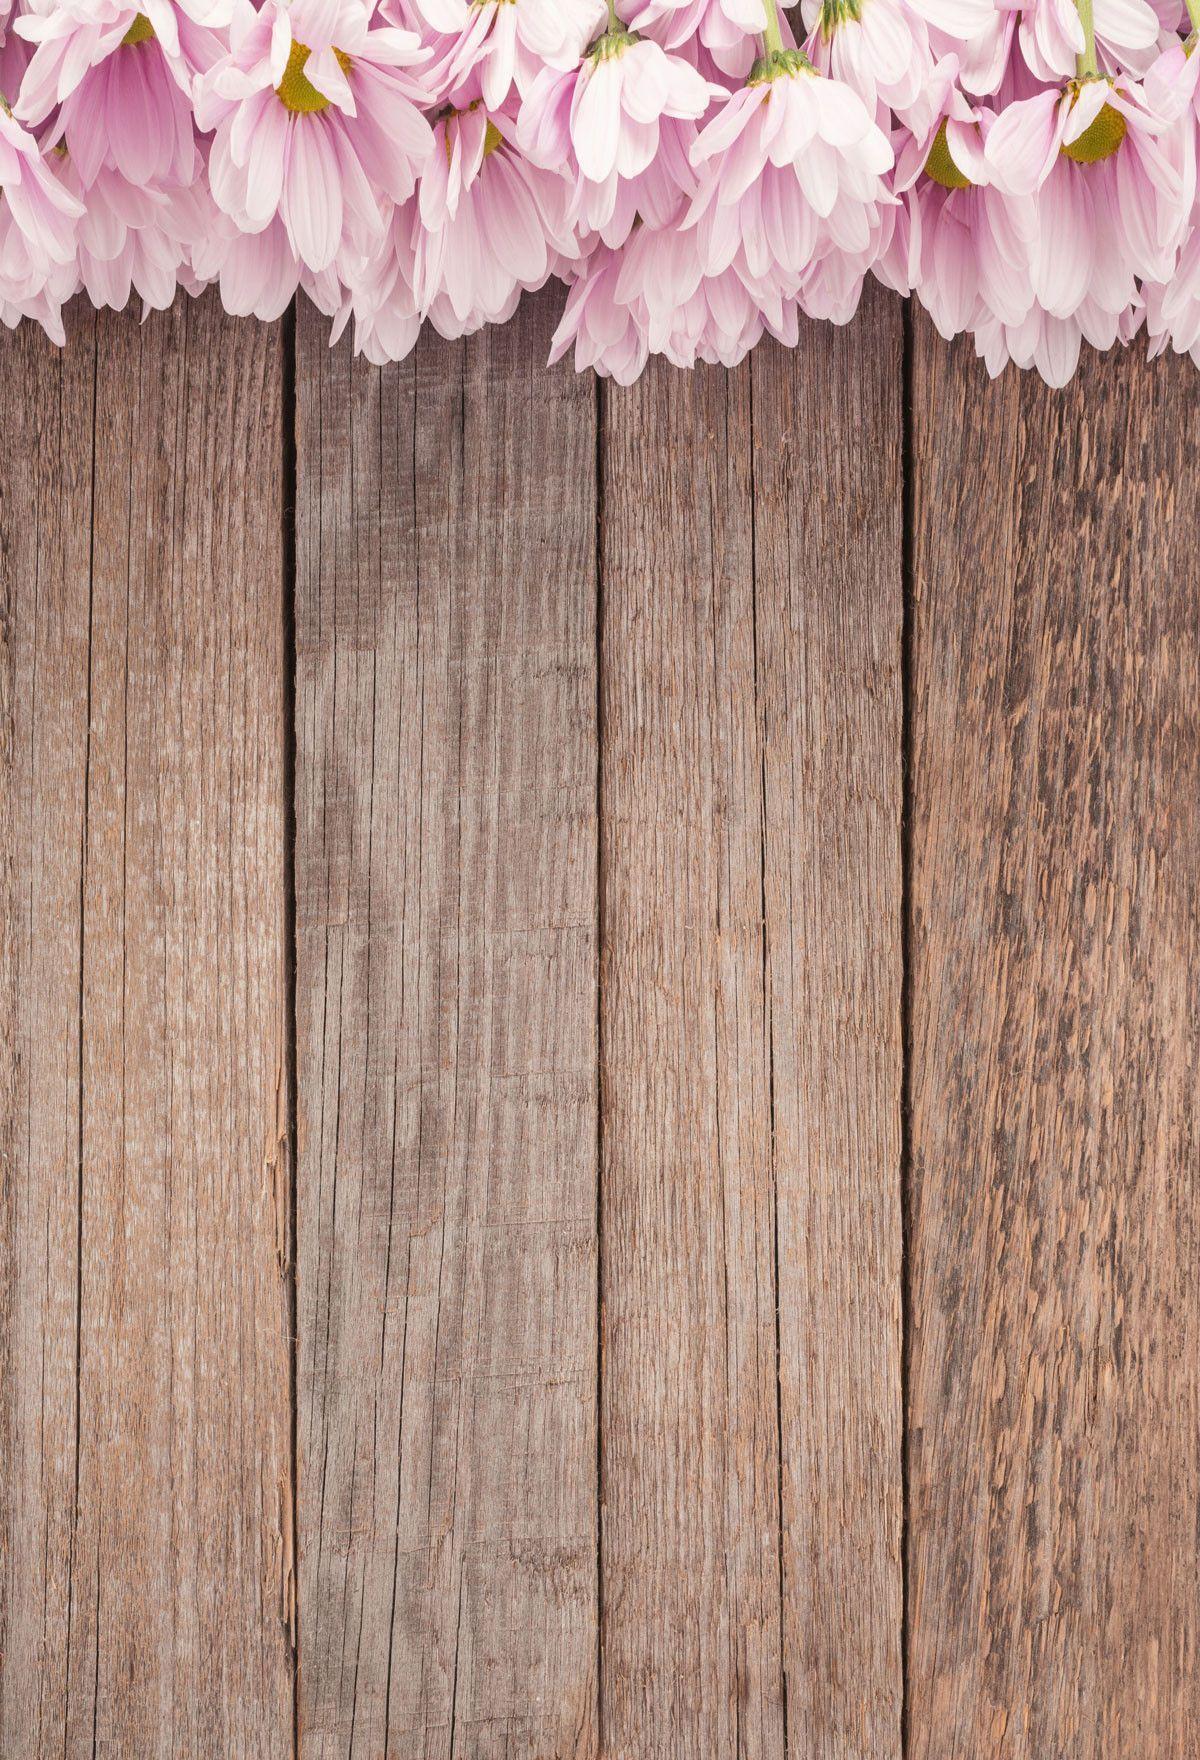 Wooden Backdrop Flower Backdrop Floral Backgrounds Wood Floor J05049 Iphonebackgrounds Wallpaper Ponsel Bunga Peony Latar Belakang